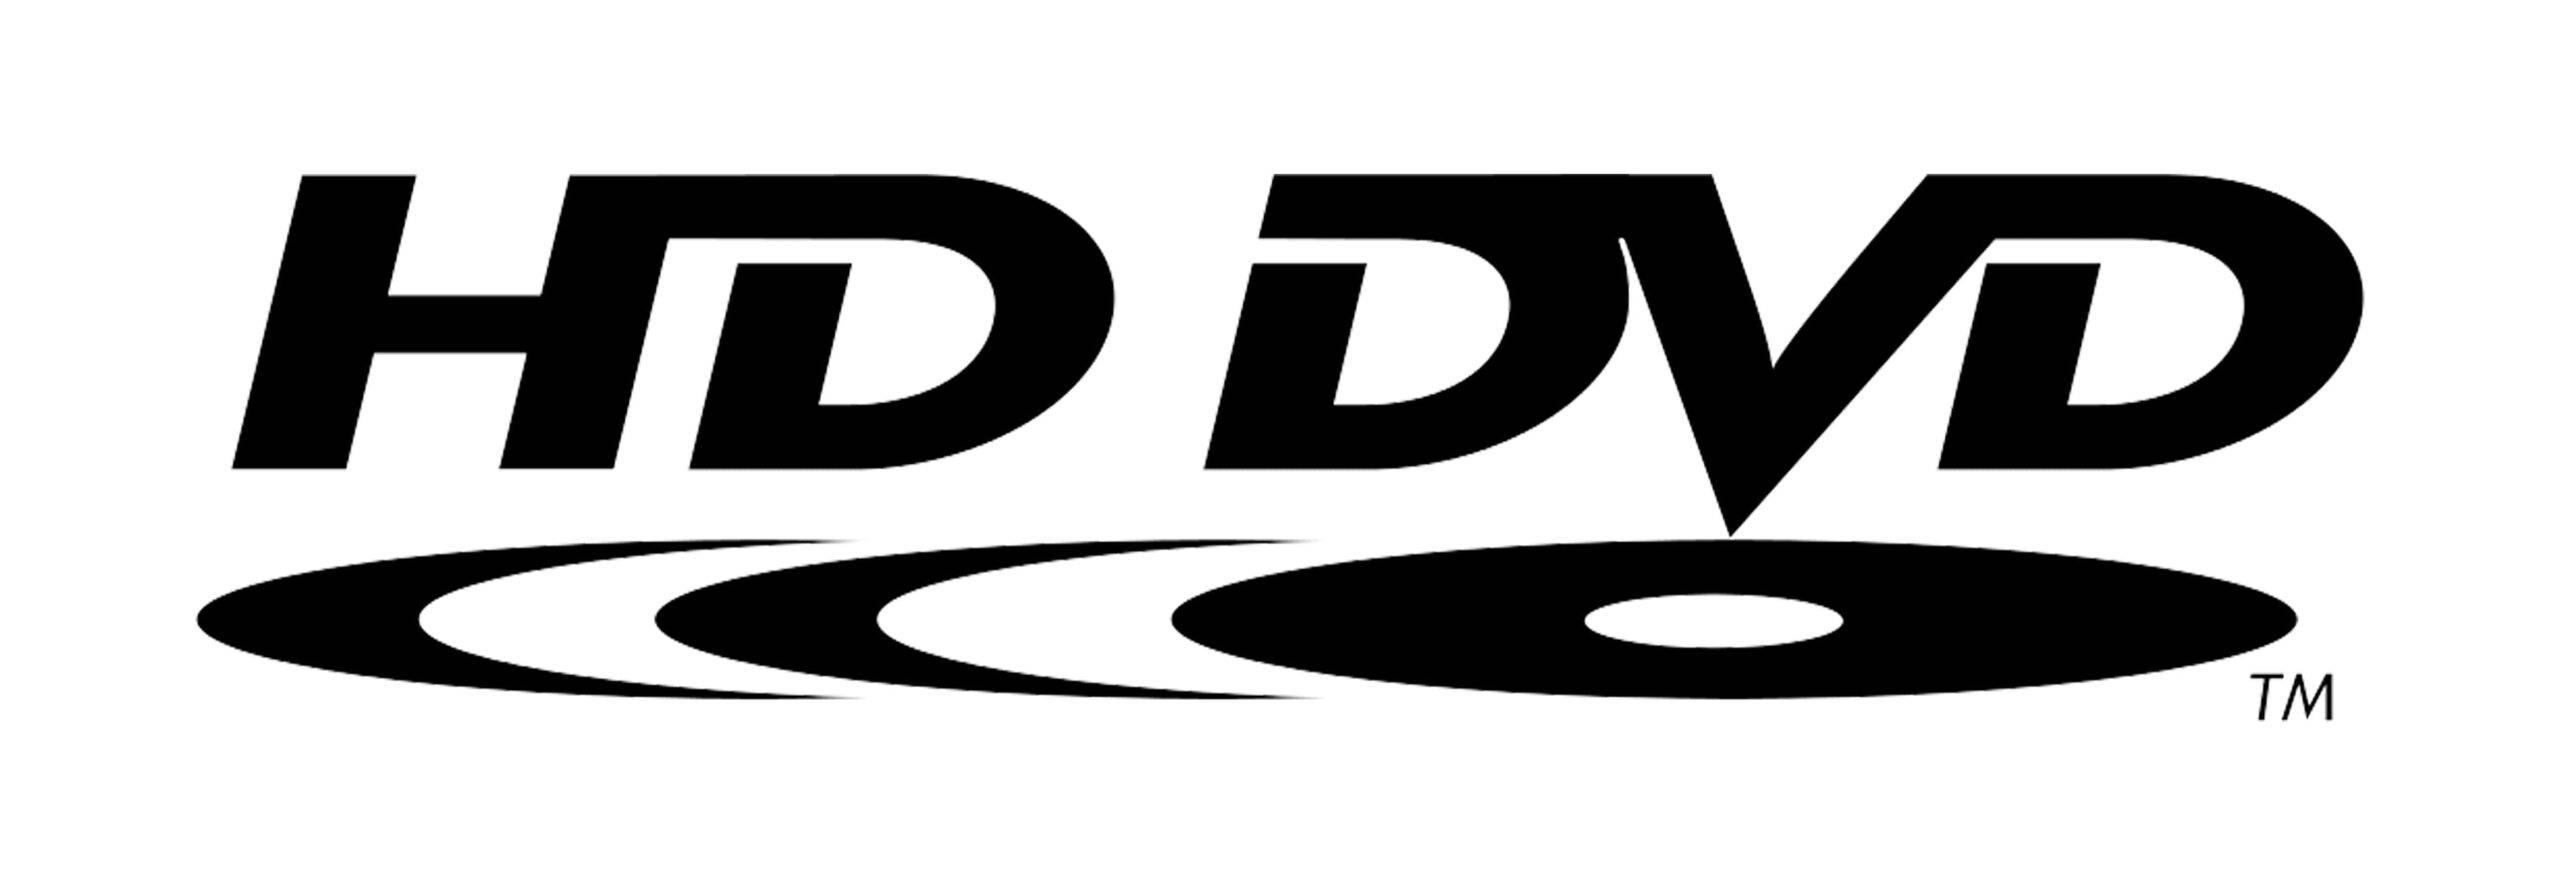 Toshiba's HD DVD